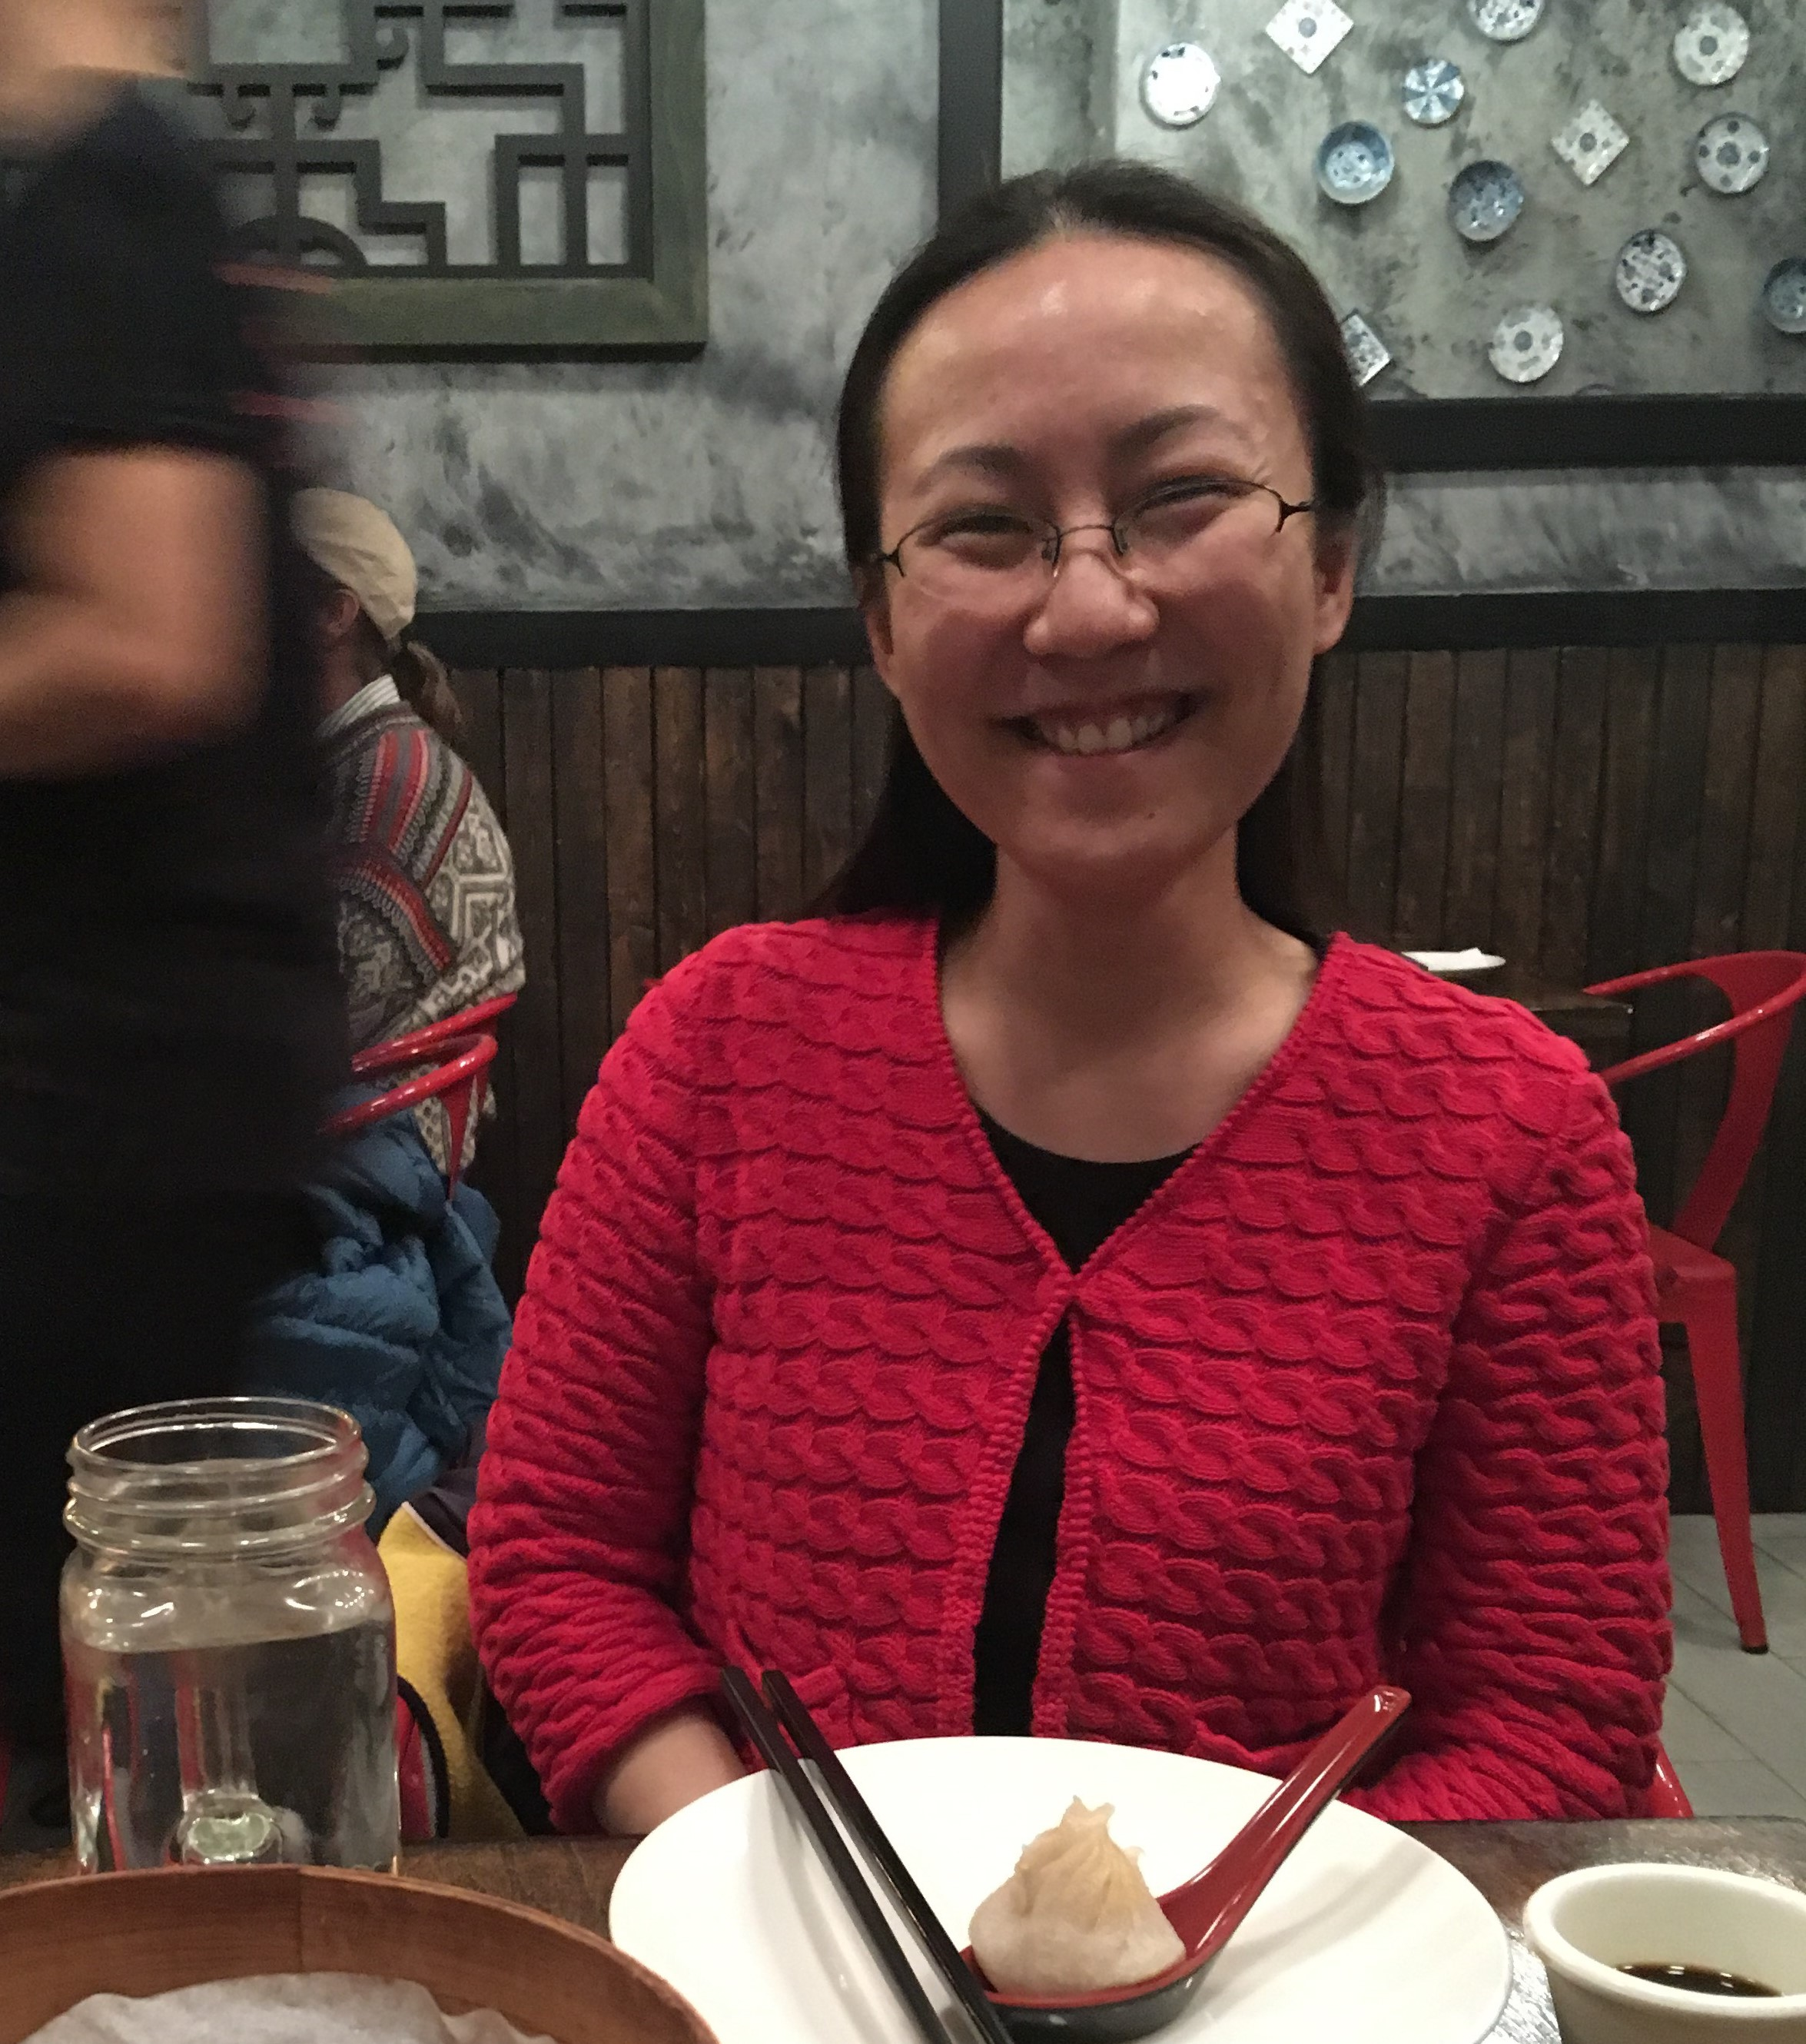 Xinyi Deng